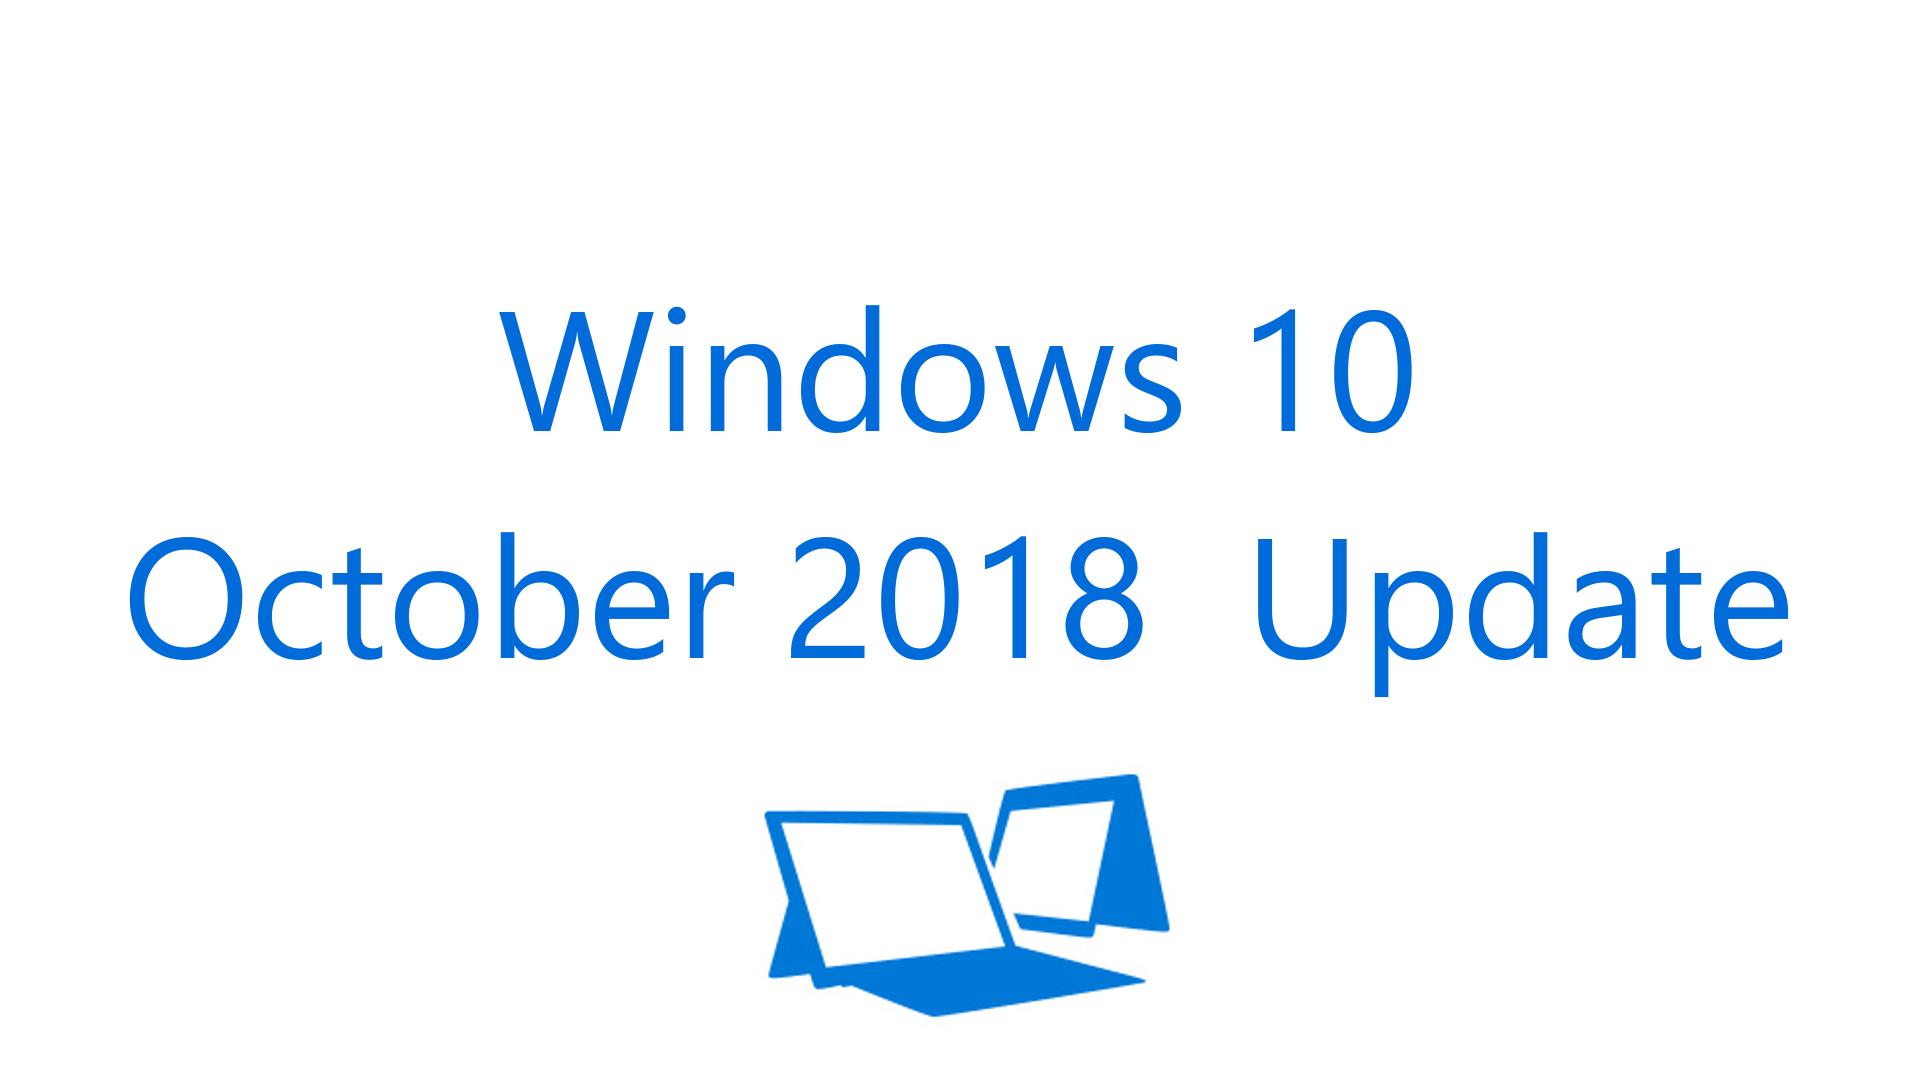 تحديث Windows 10 October 2018 Update